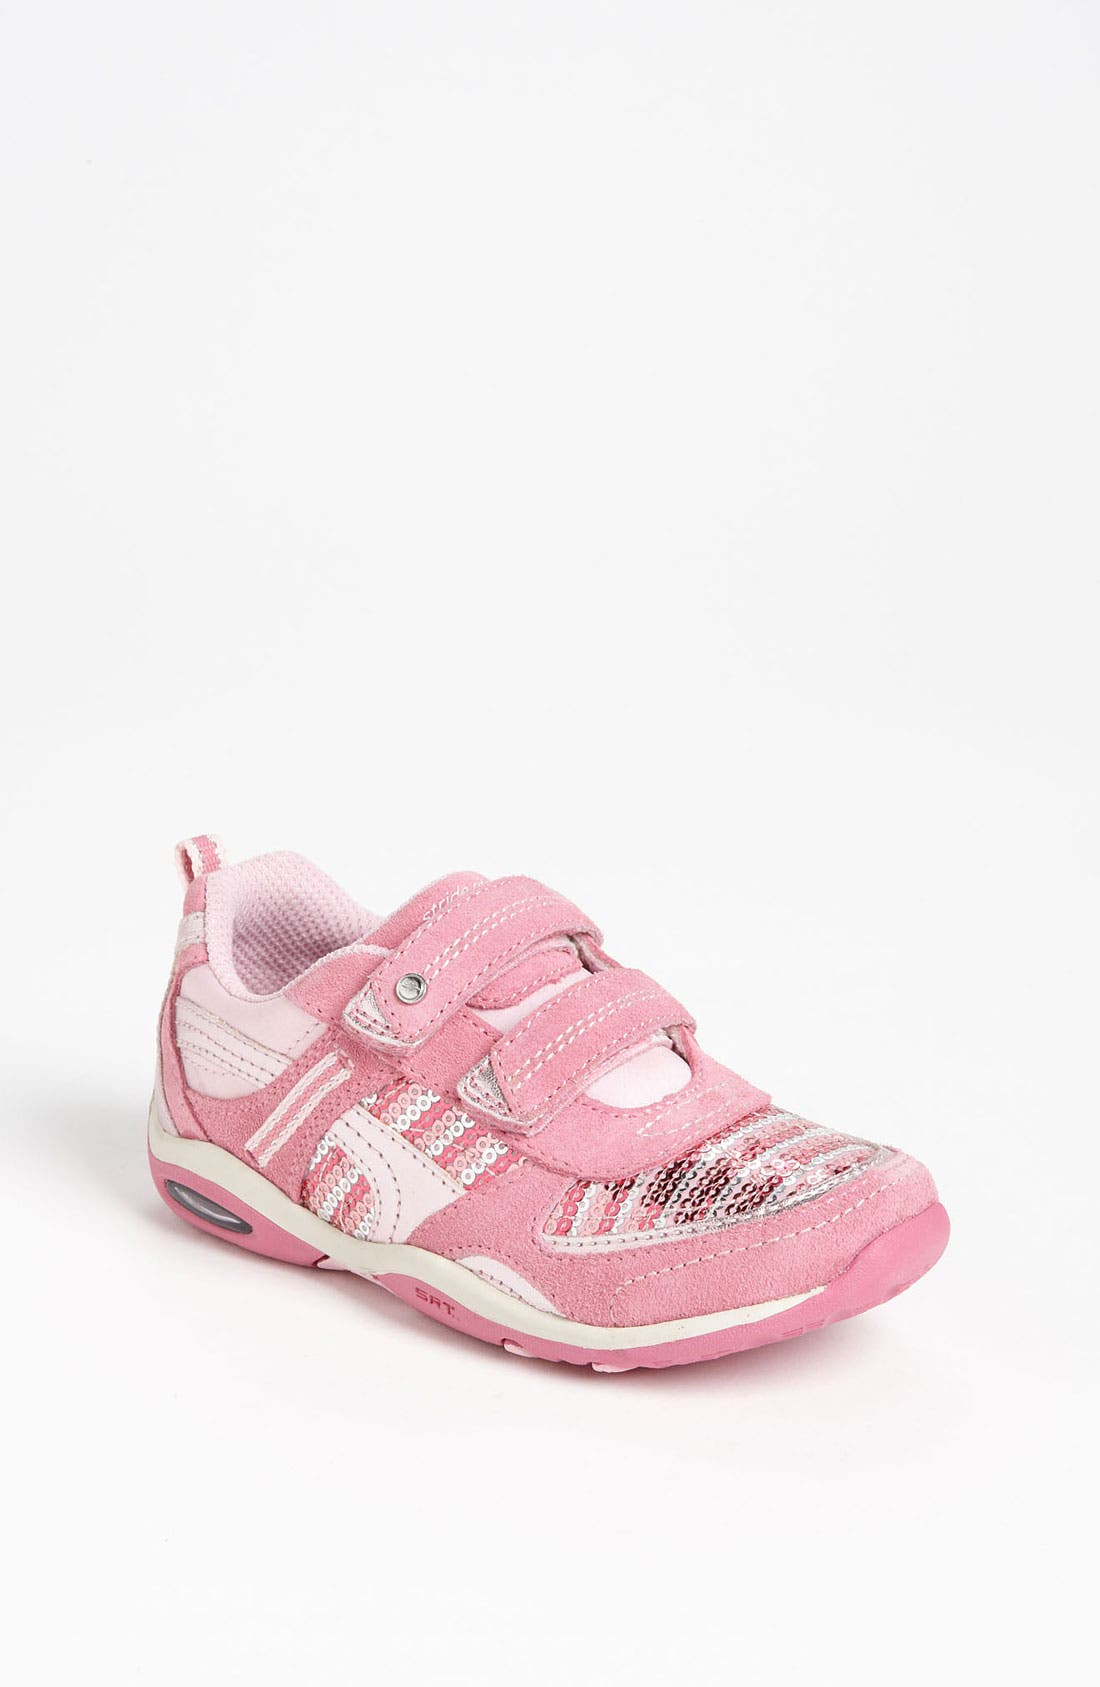 Main Image - Stride Rite 'Maxi' Sneaker (Toddler & Little Kid)